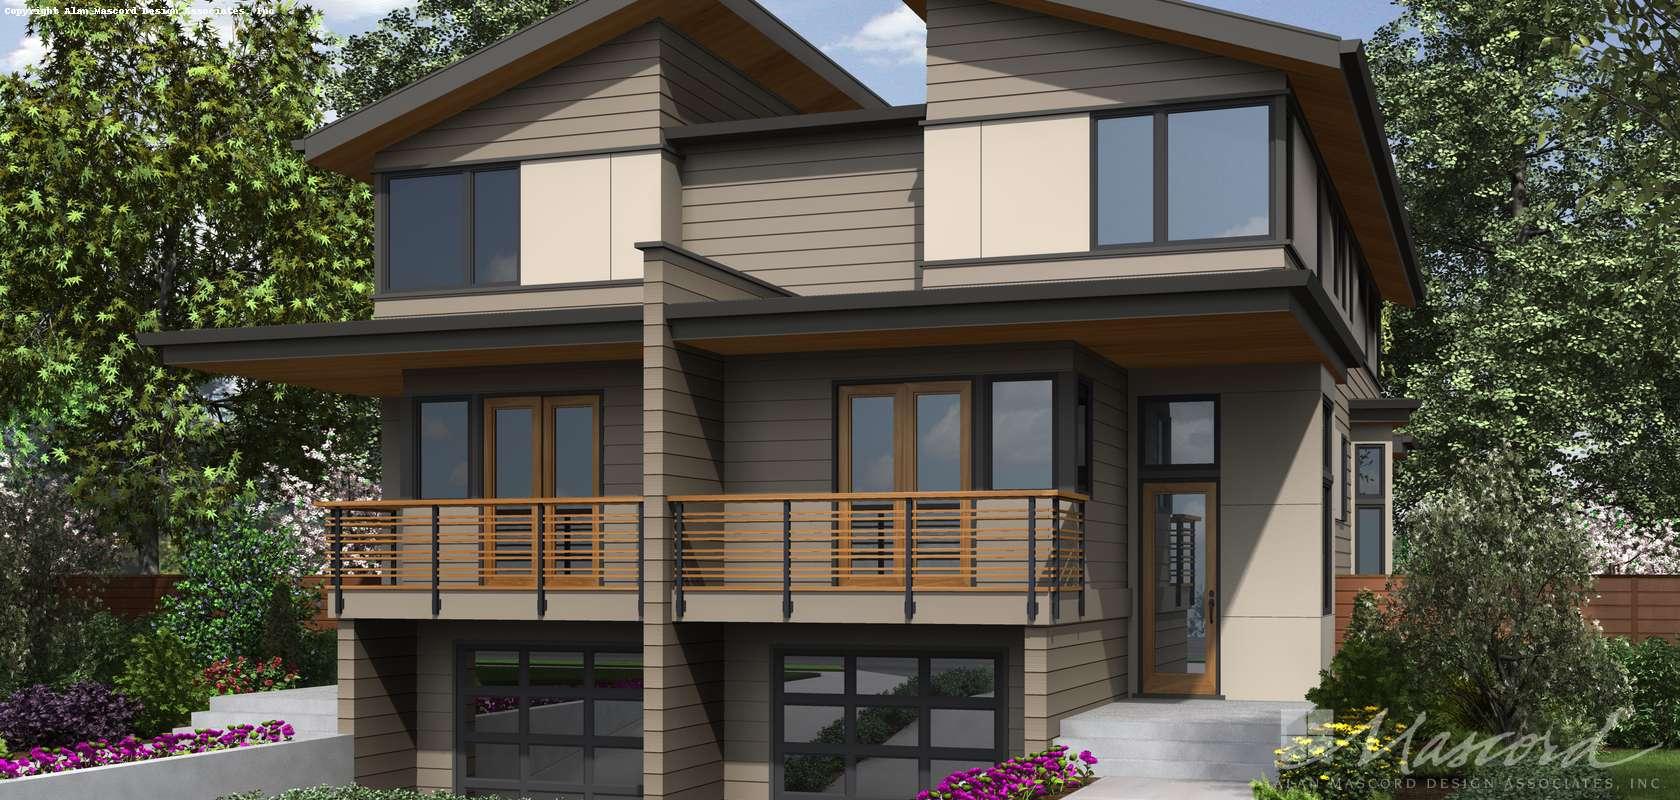 Mascord House Plan 4044: The Grand Teton